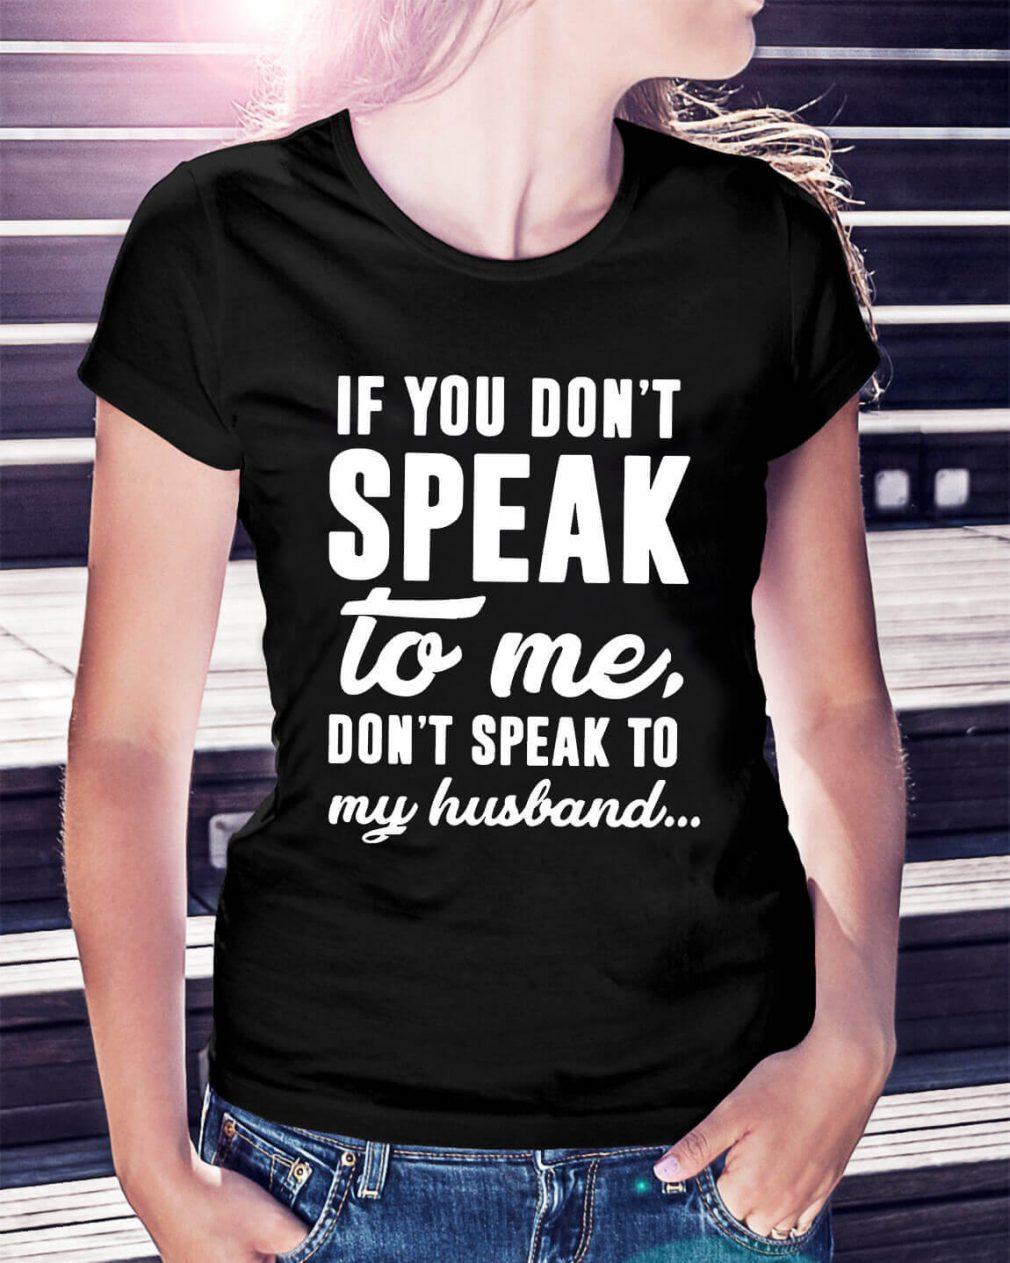 If you don't speak to me don't speak to my husband Ladies Tee